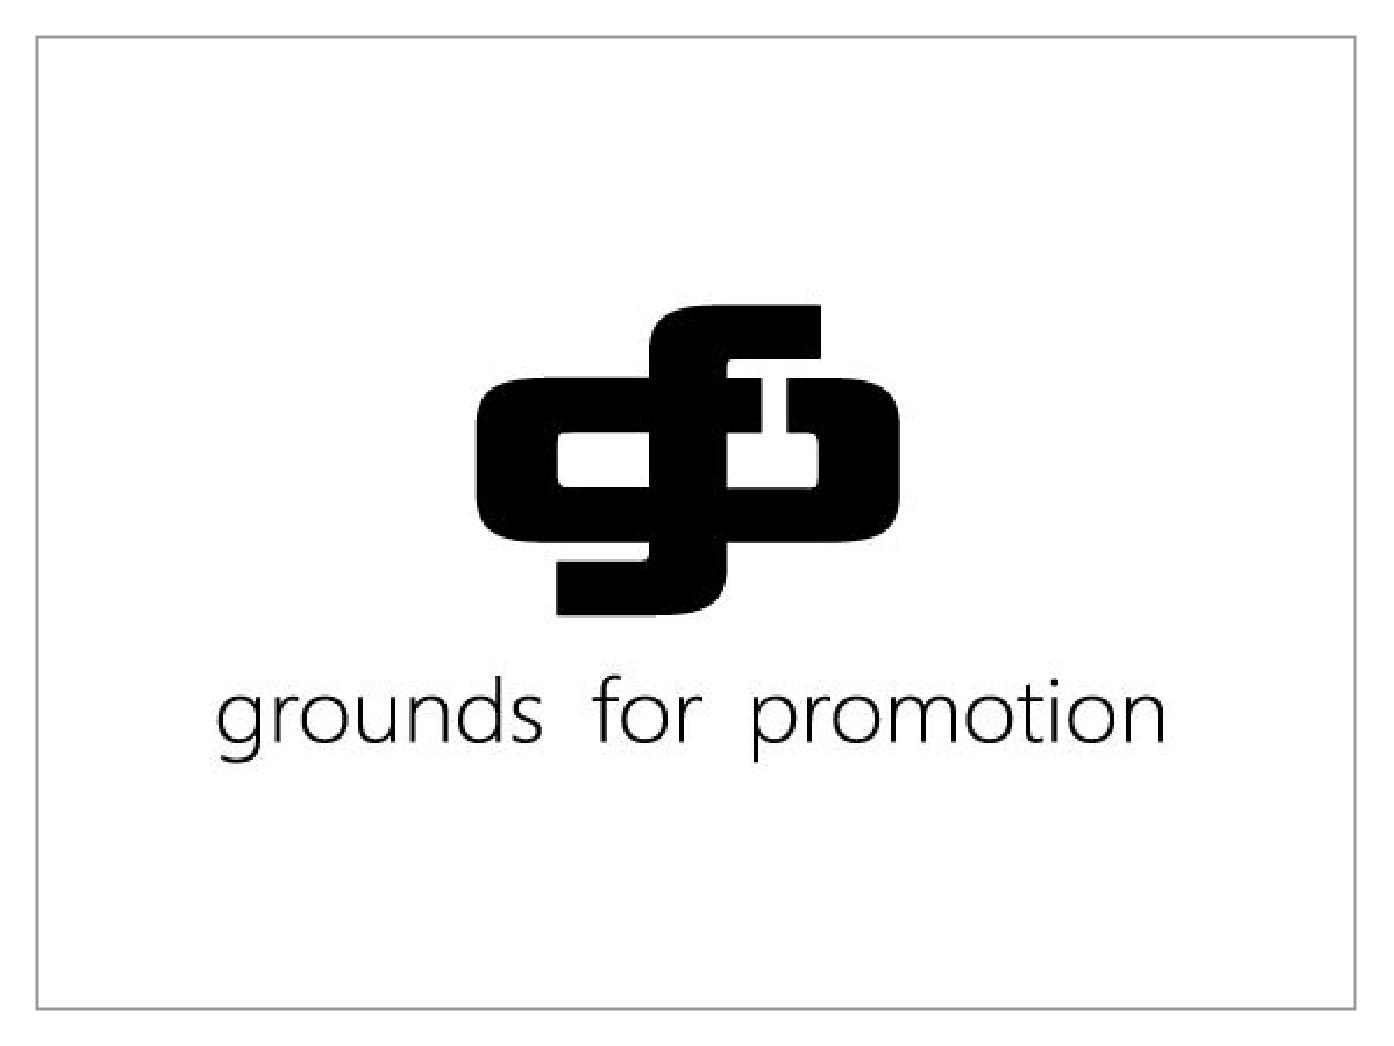 groundsforpromotion_Logo.png